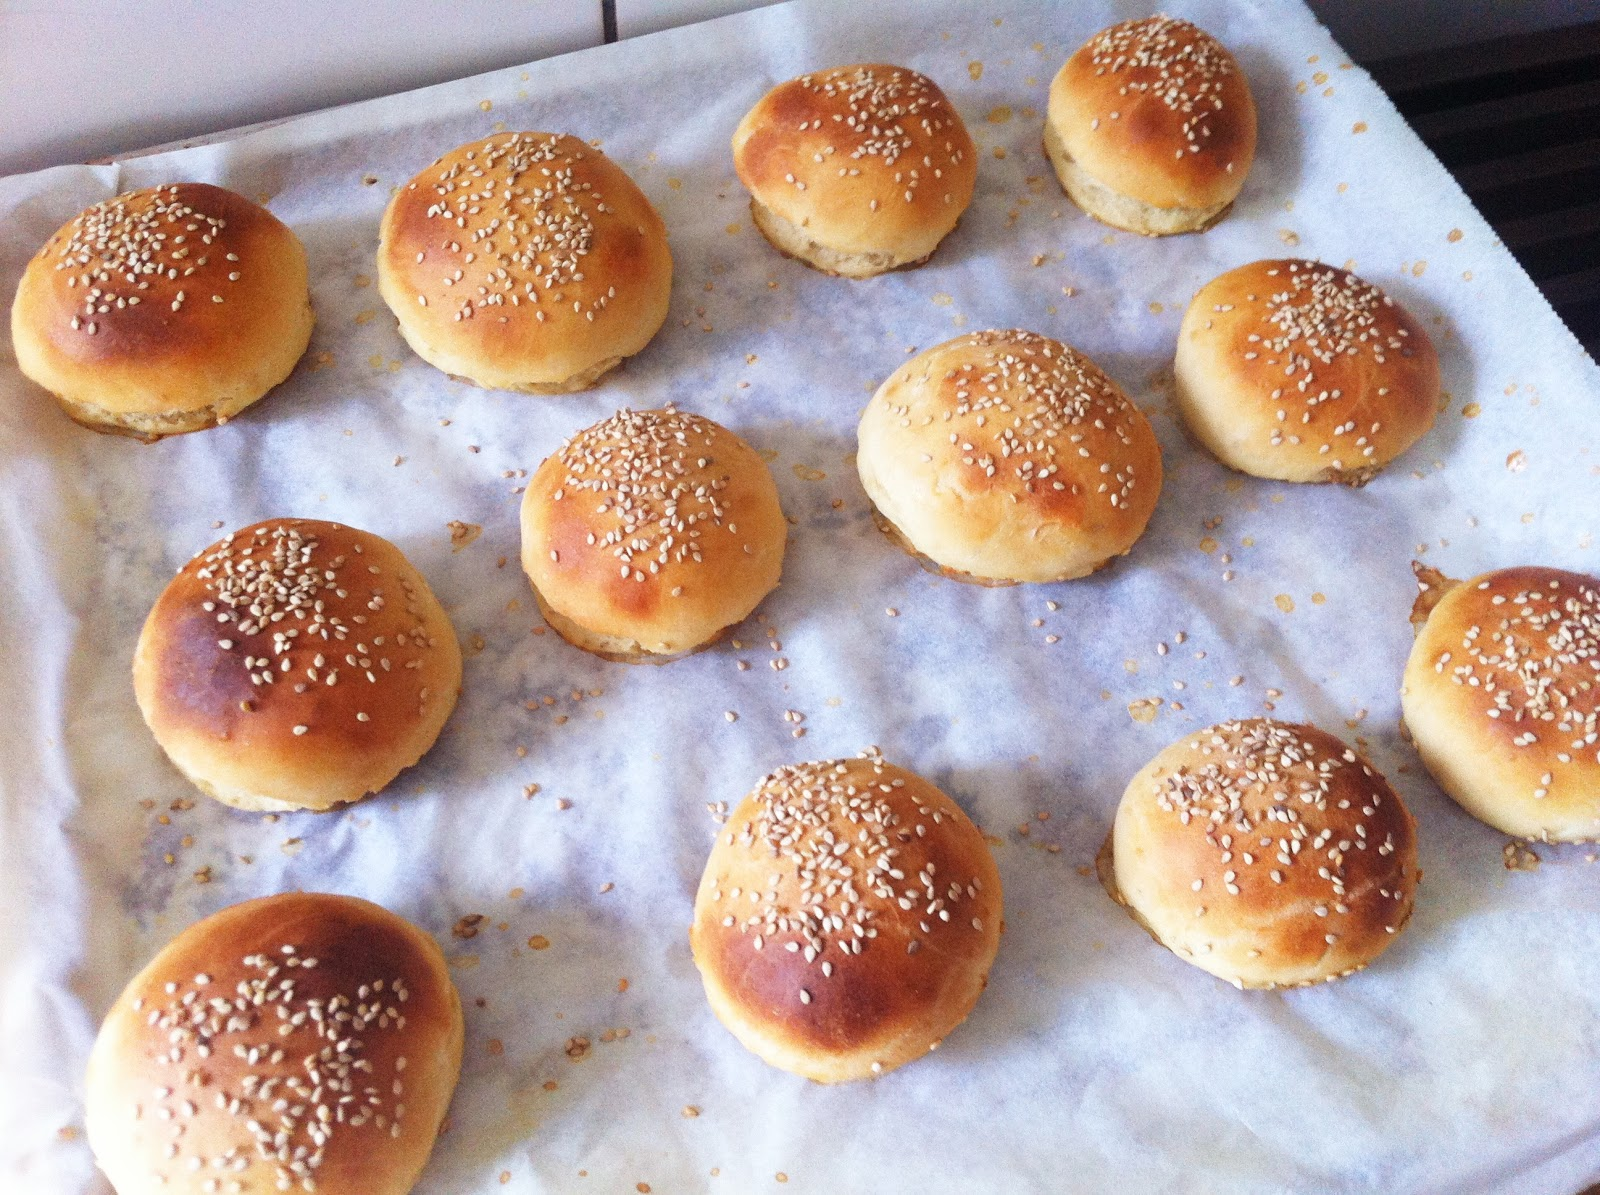 Witte Bloem Keuken : Voor 12 kleine of 6 normale hamburgerbroodjes